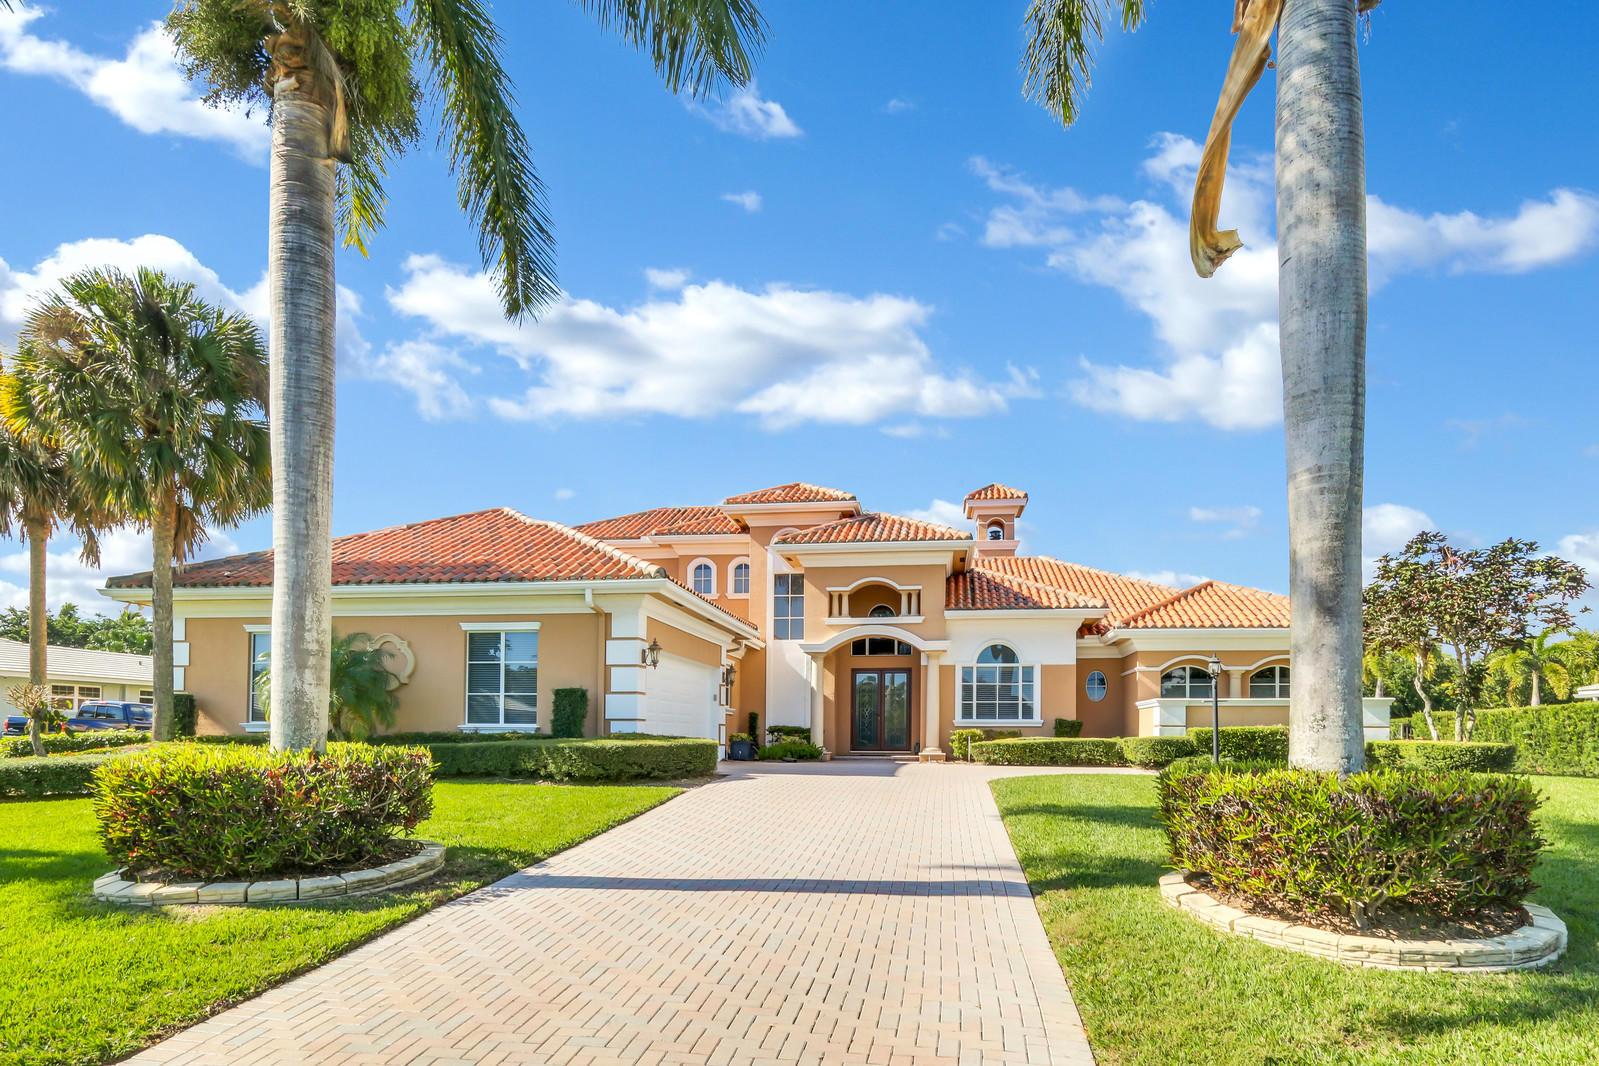 10633 Pine Tree Terrace, Boynton Beach, FL 33436